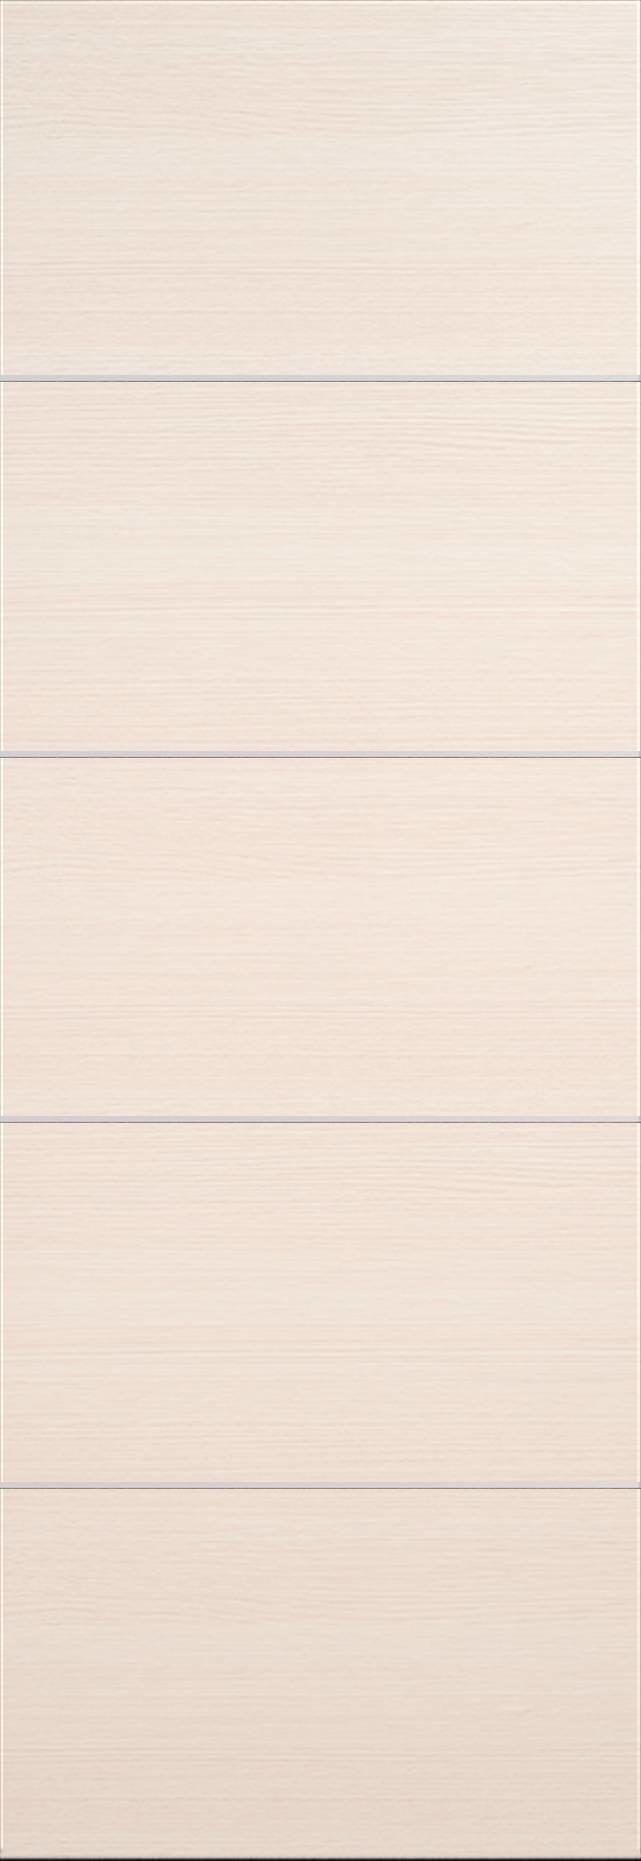 Tivoli Д-3 Invisible цвет - Беленый дуб Без стекла (ДГ)